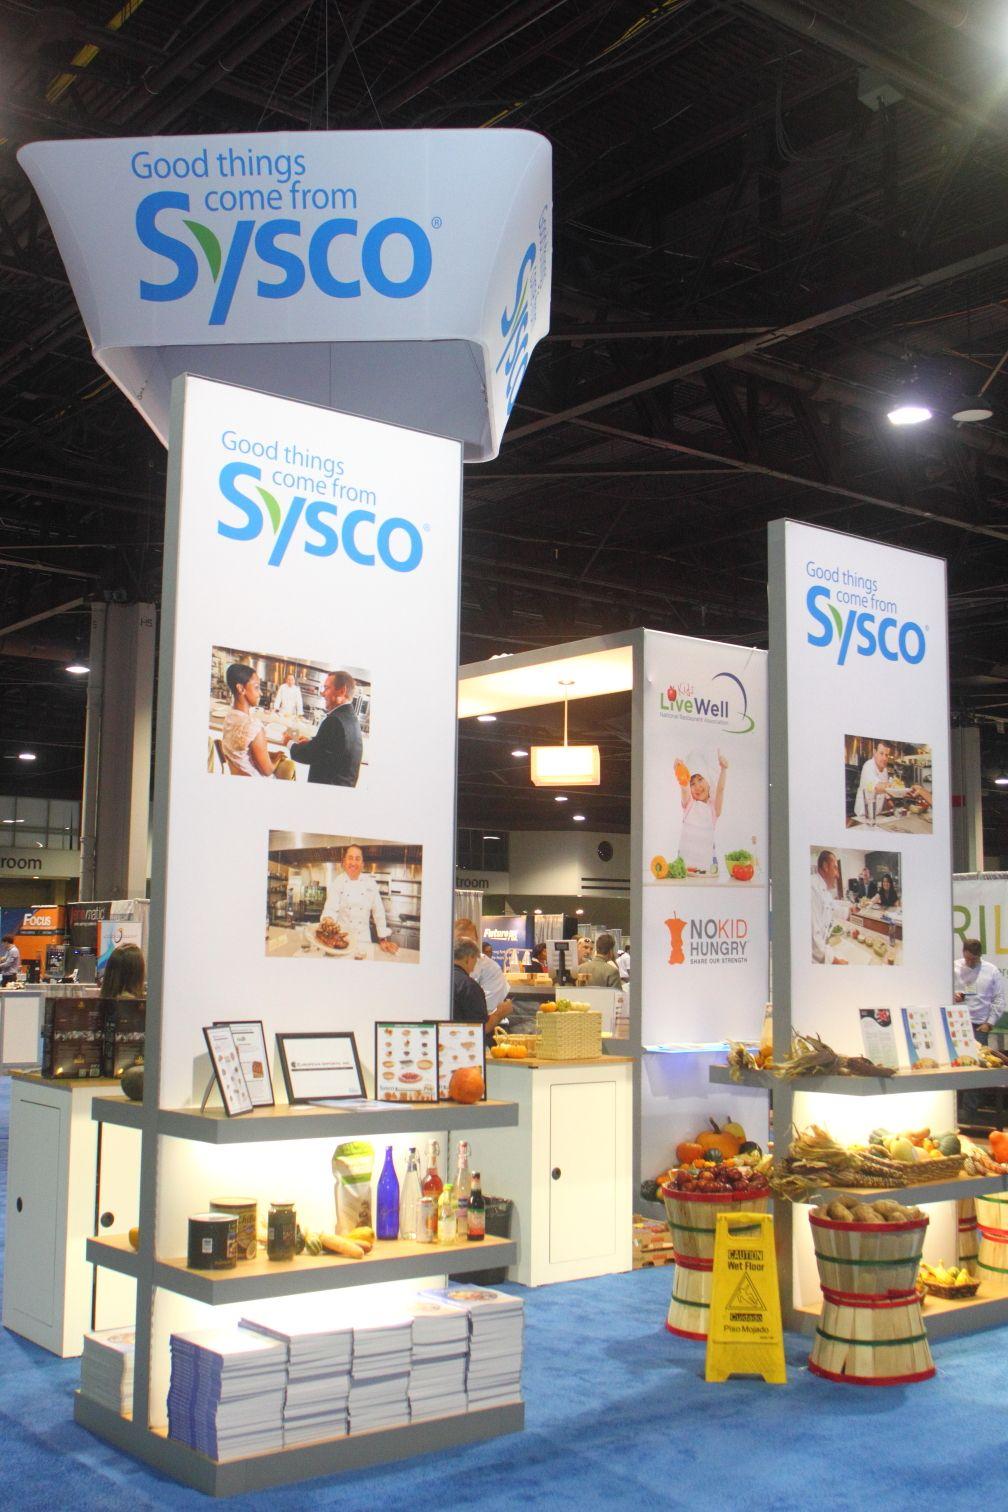 Sysco Booth At The 2013 Atlanta Foodservice Expo At The Georgia